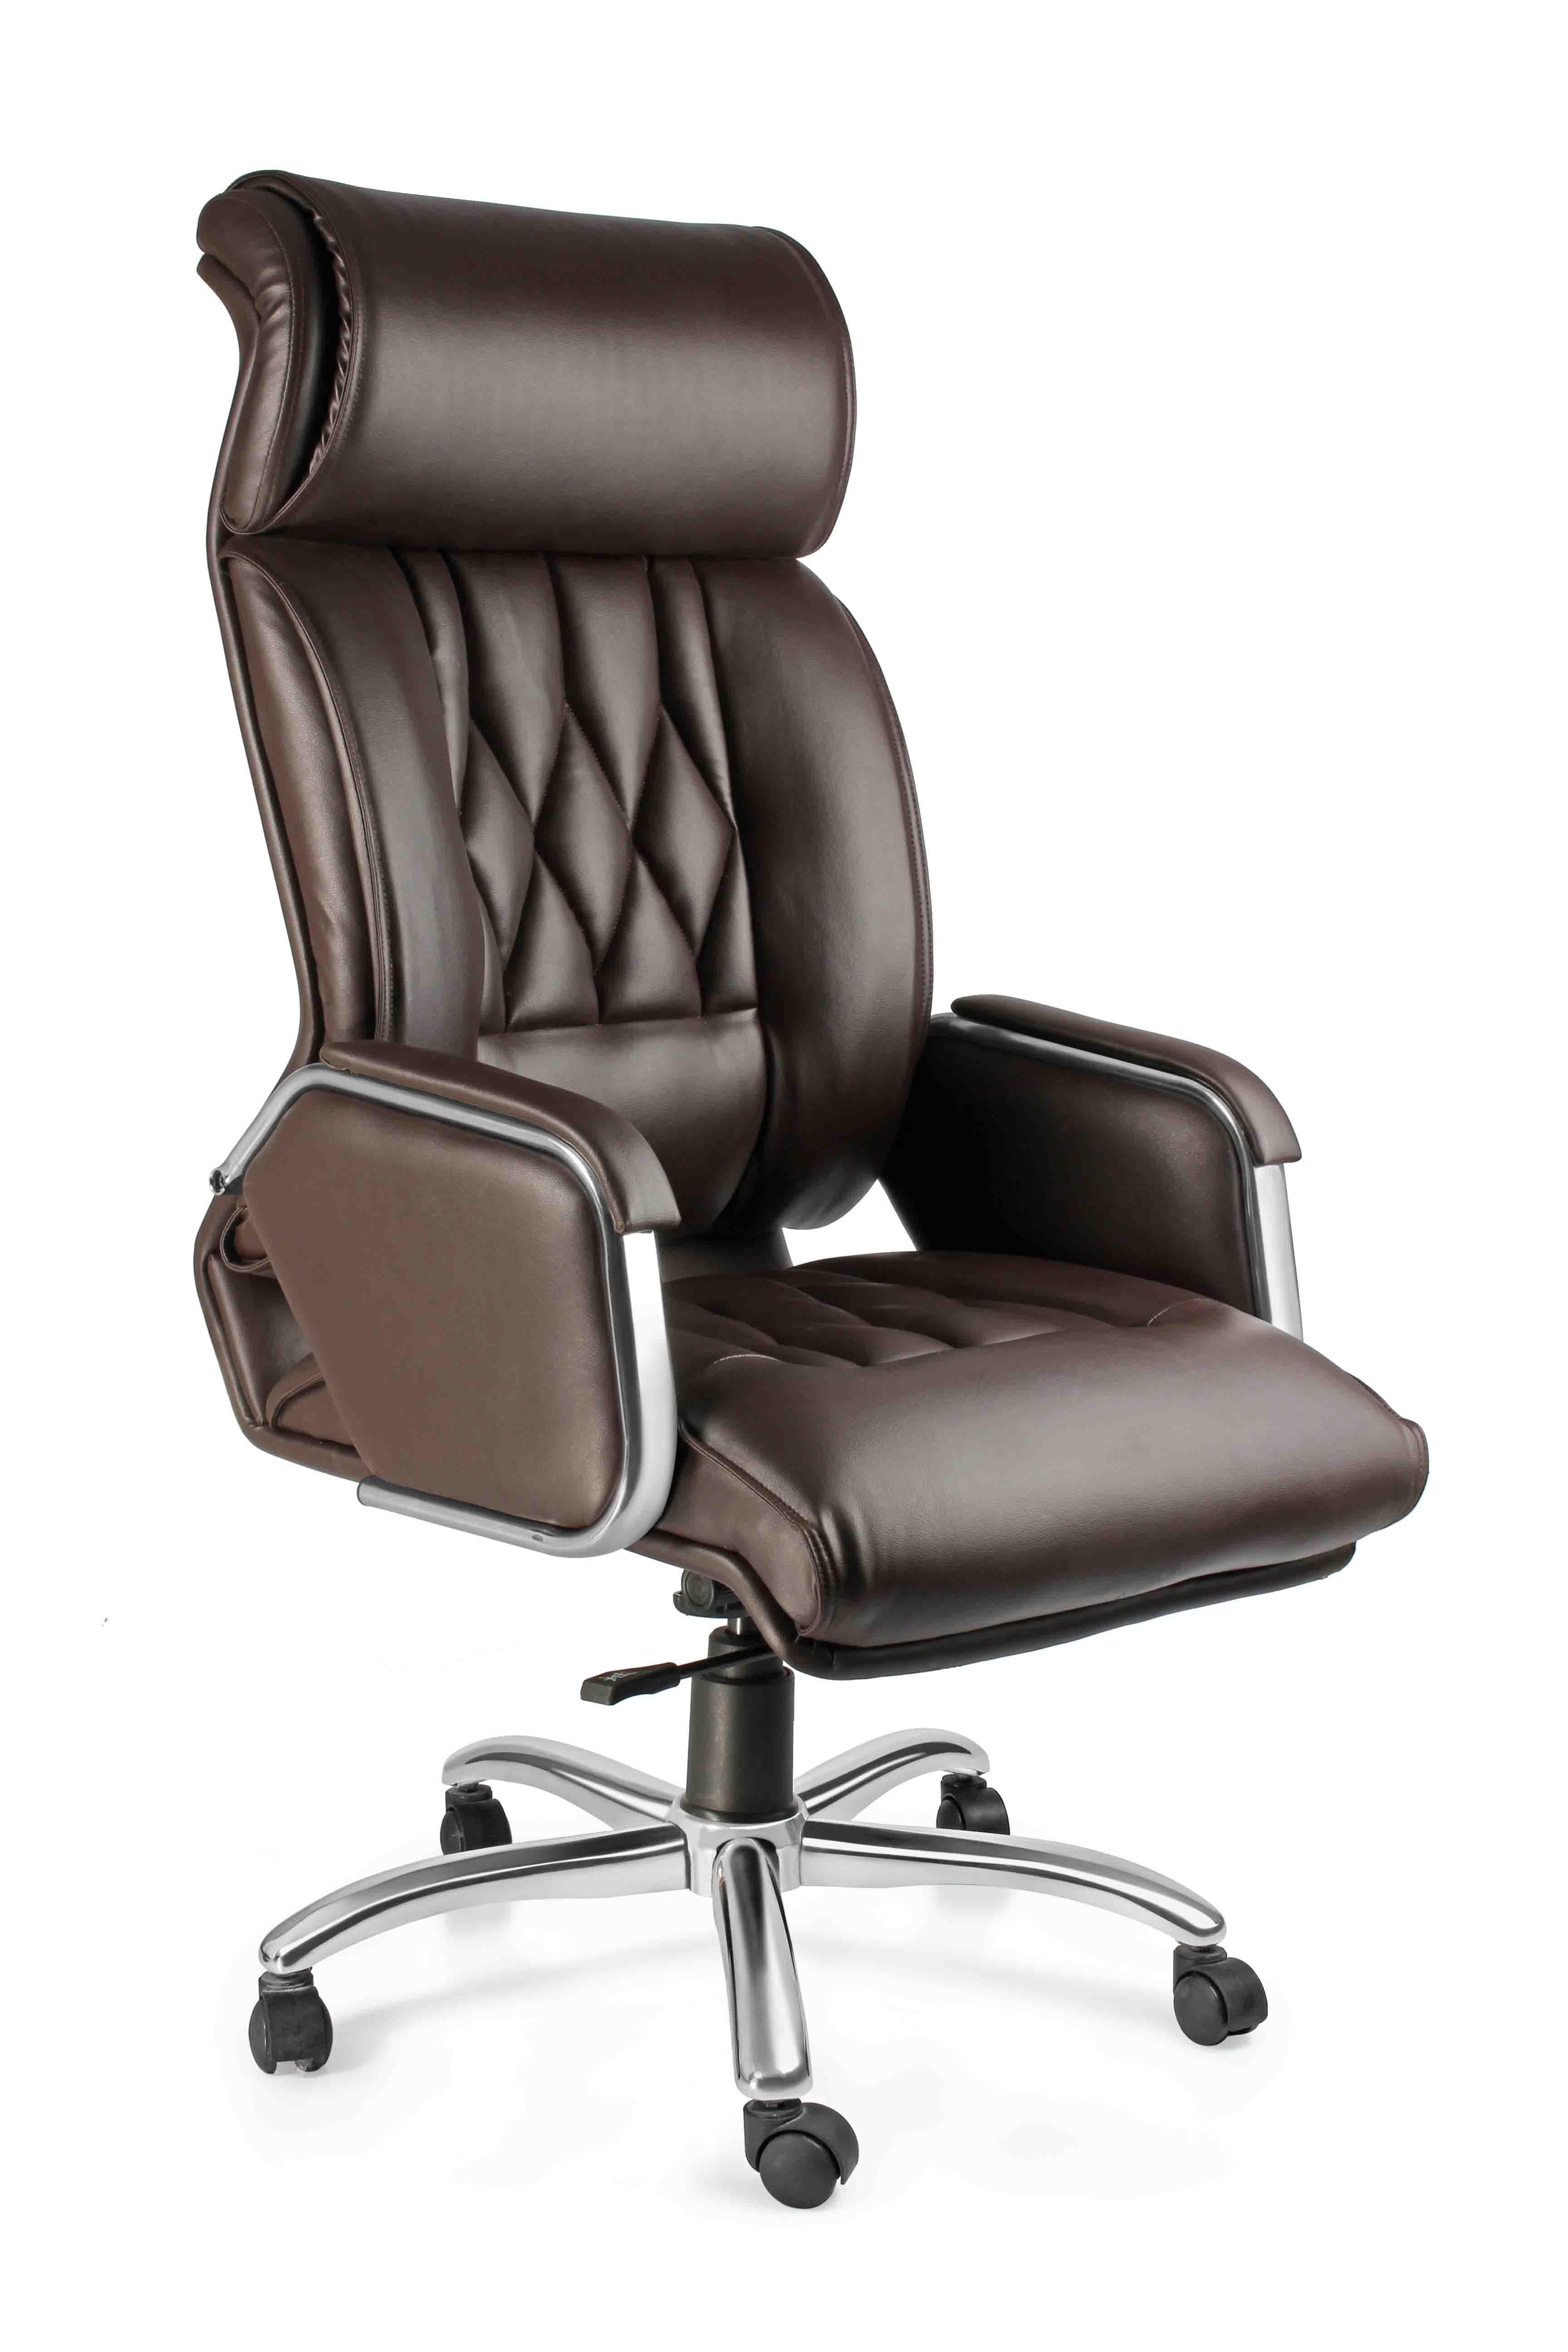 revolving chair price in jaipur big camping maruti furniture executive h b